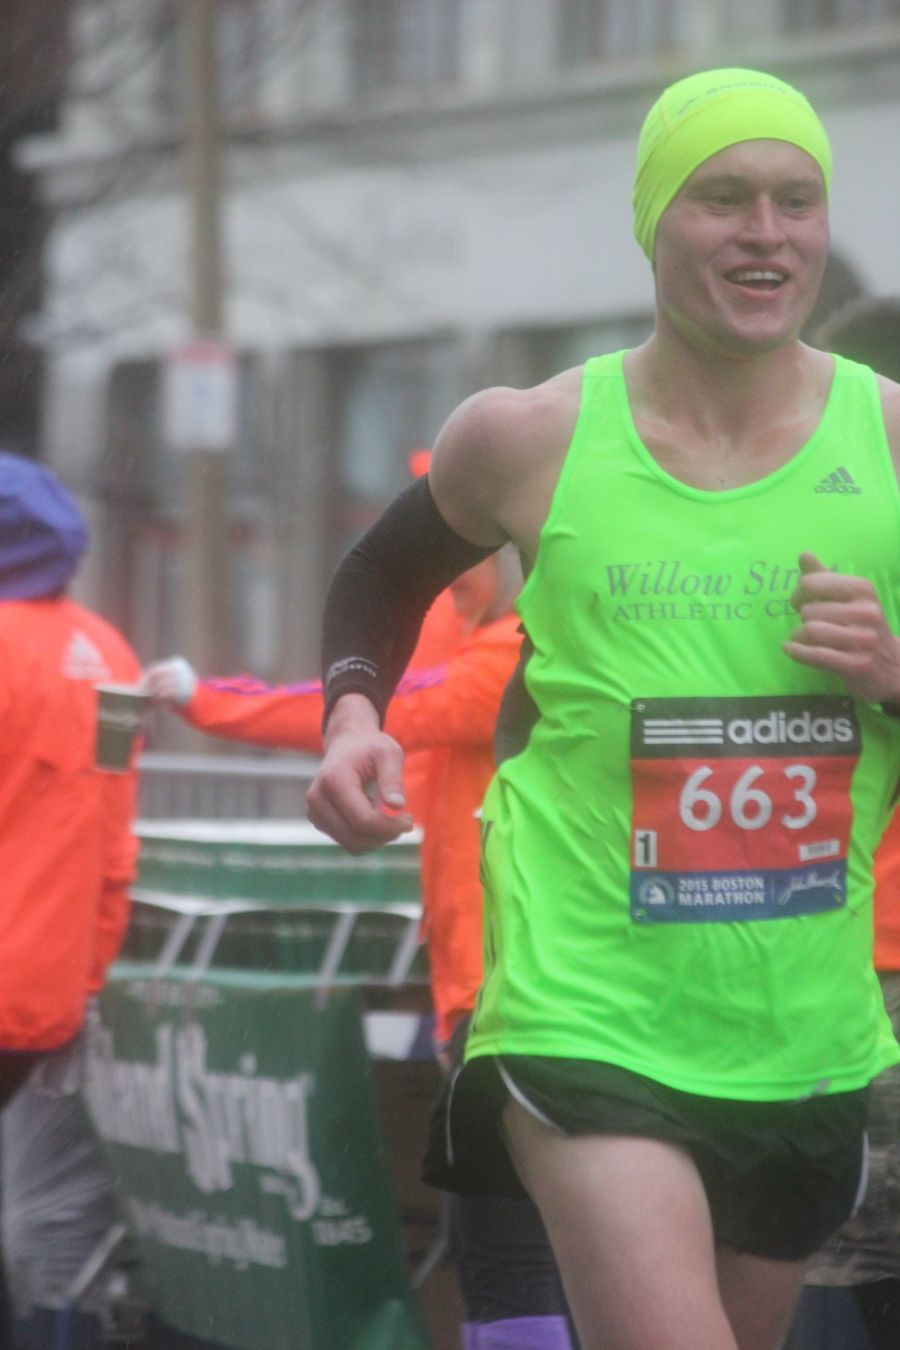 boston marathon april 20 2015 racer number 663